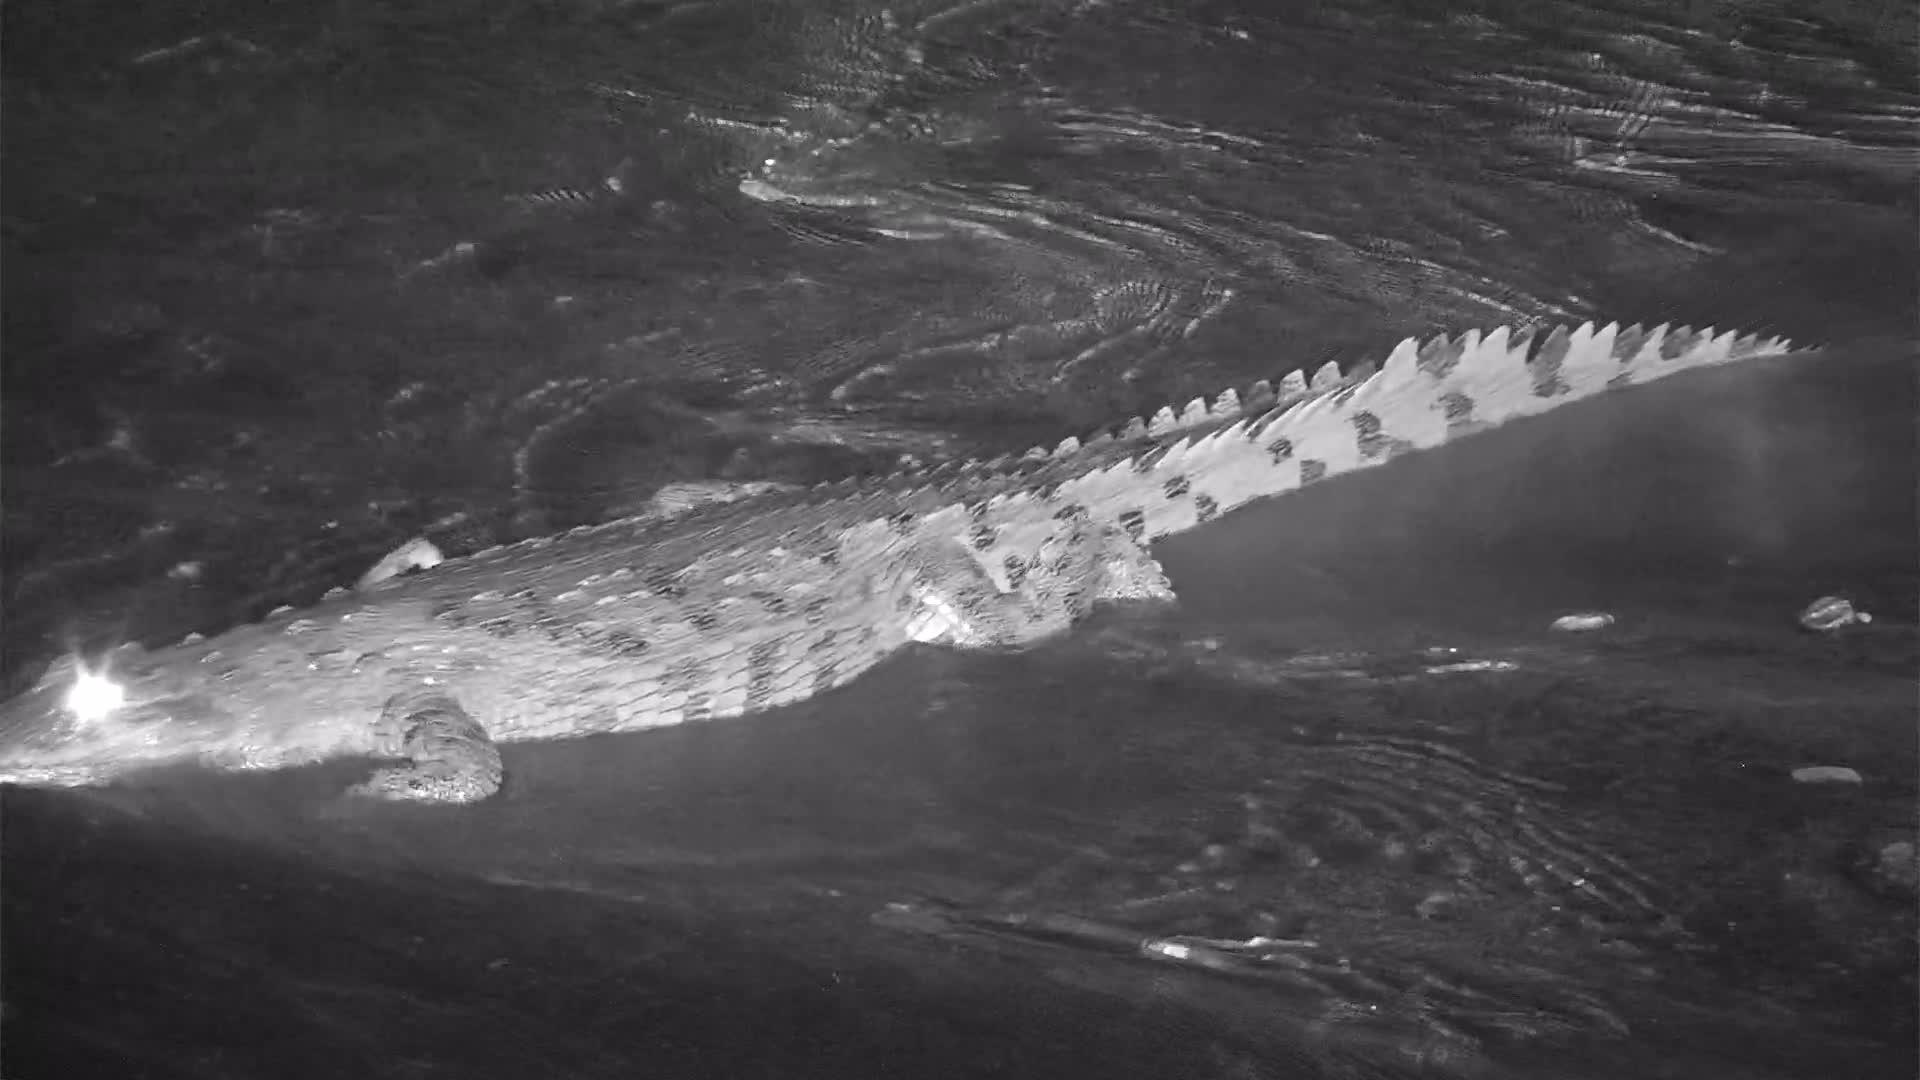 VIDEO: Crocodile lumbering across the sandbar